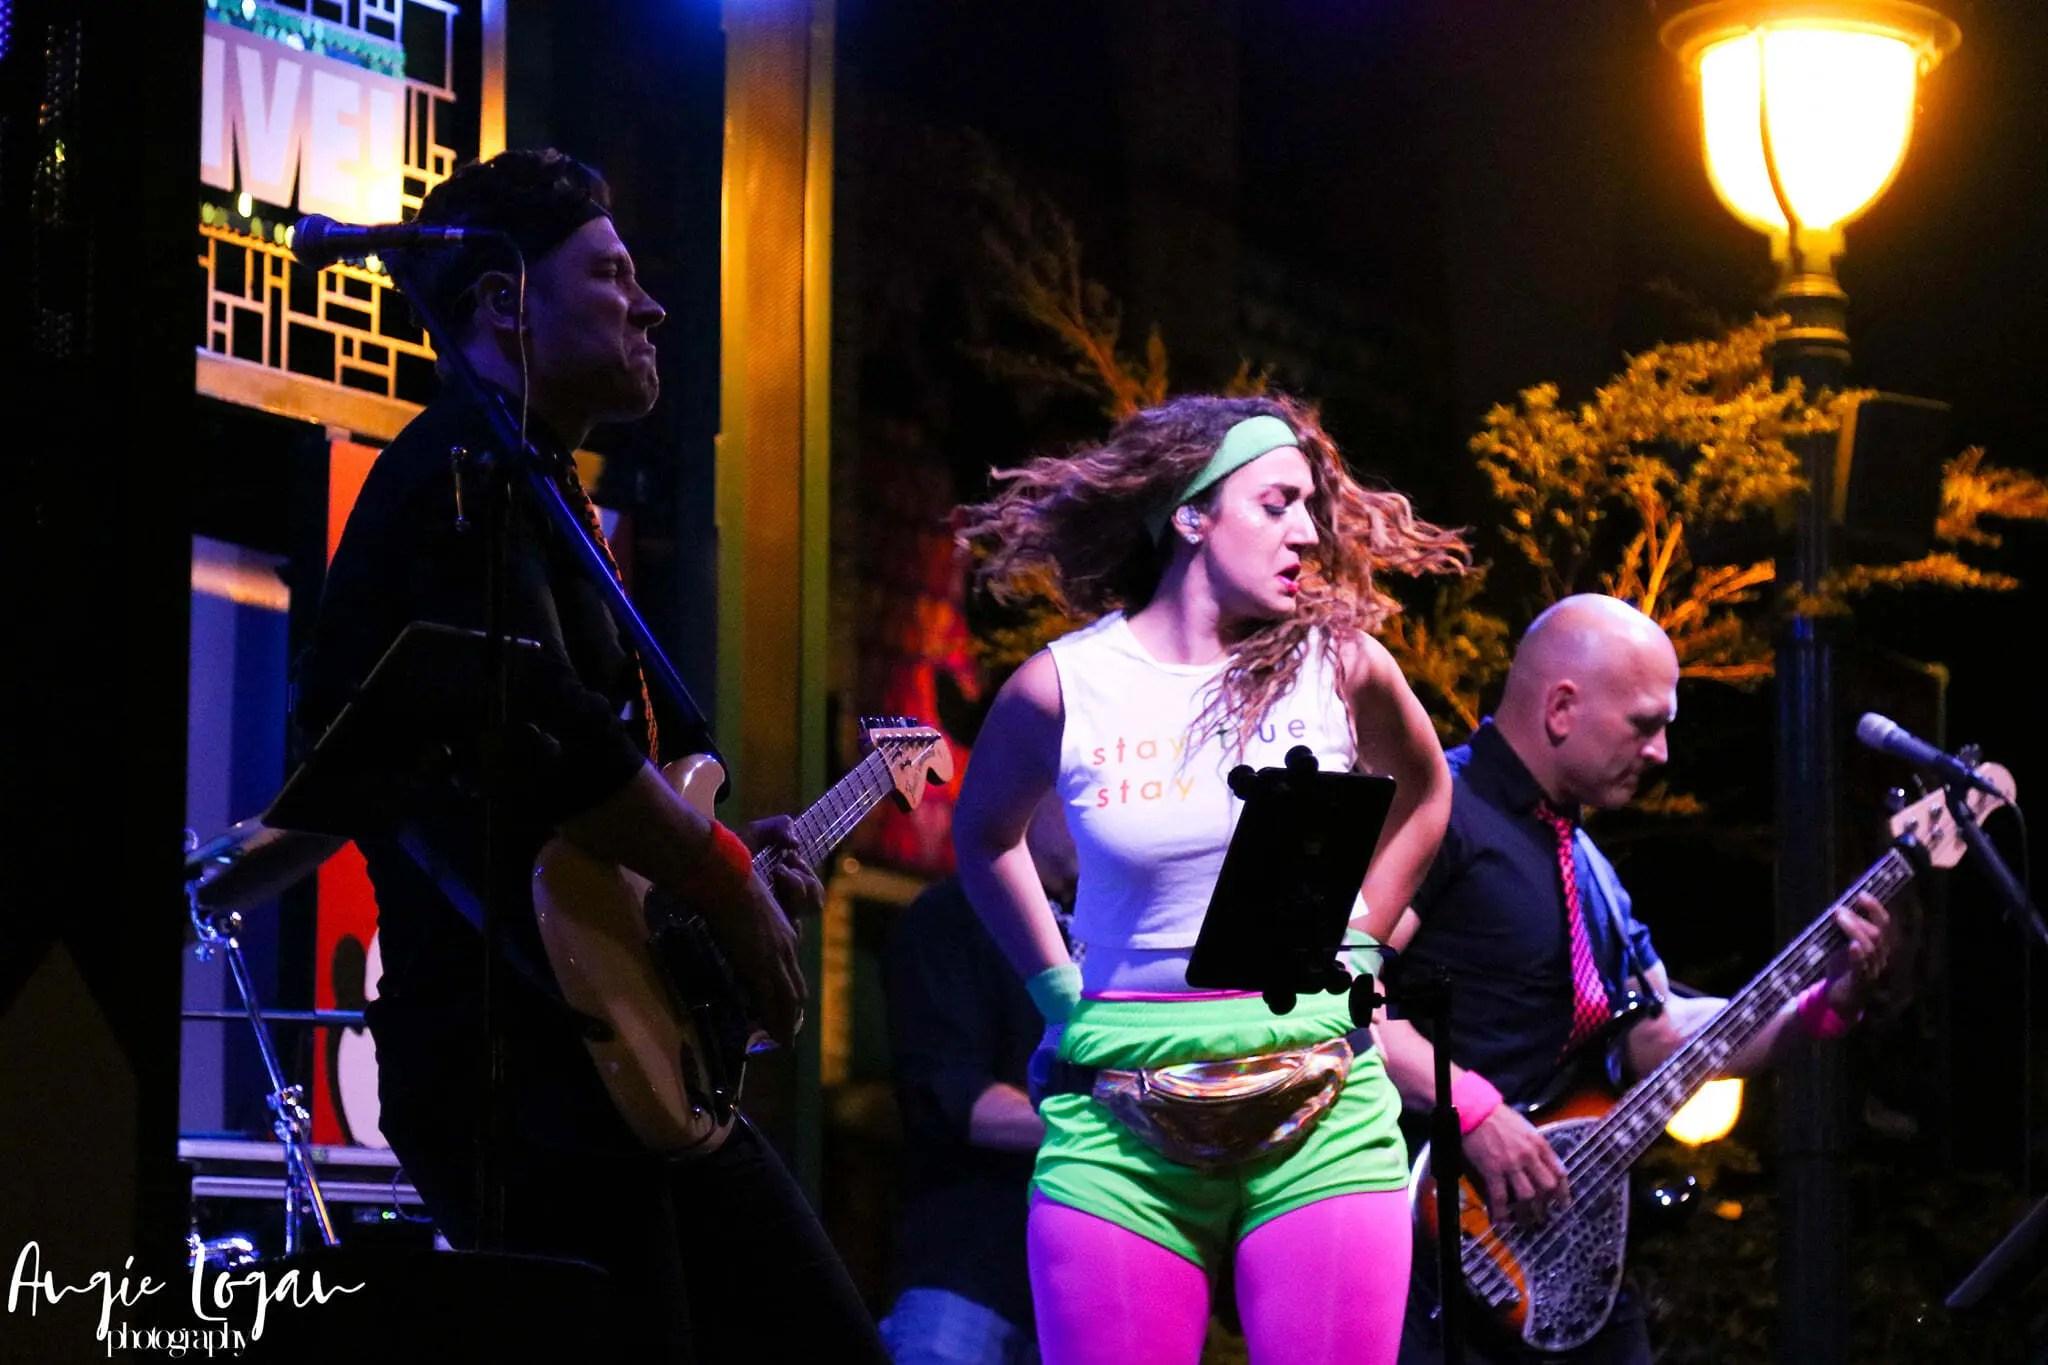 Danny Knapp Melonhead Downtown Disney Show Live